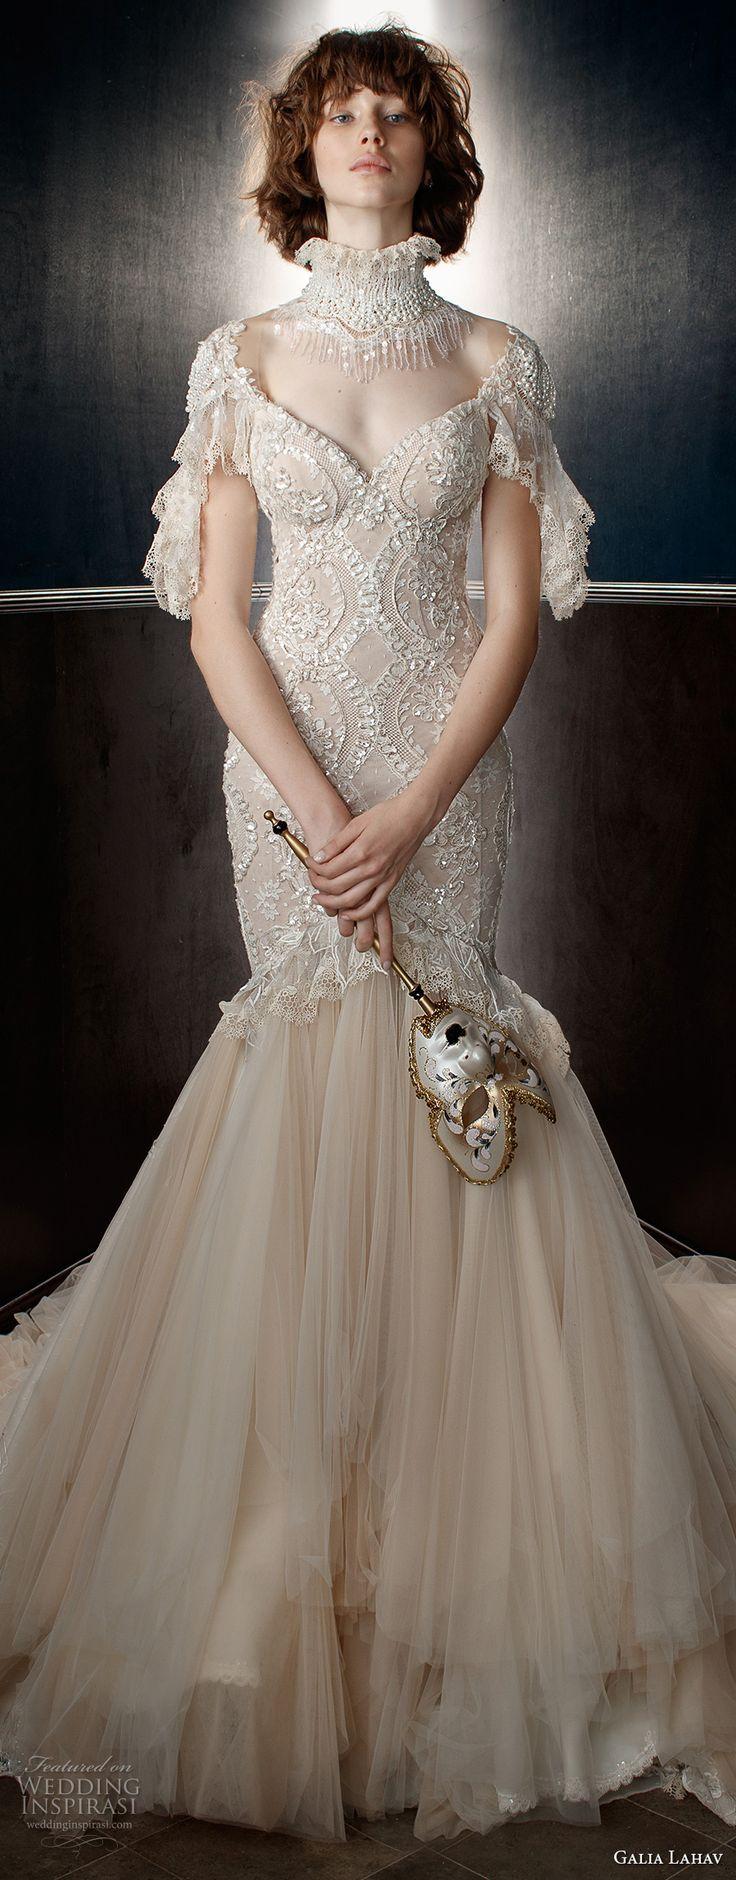 Galia lahav spring bridal short sleeves illusion high